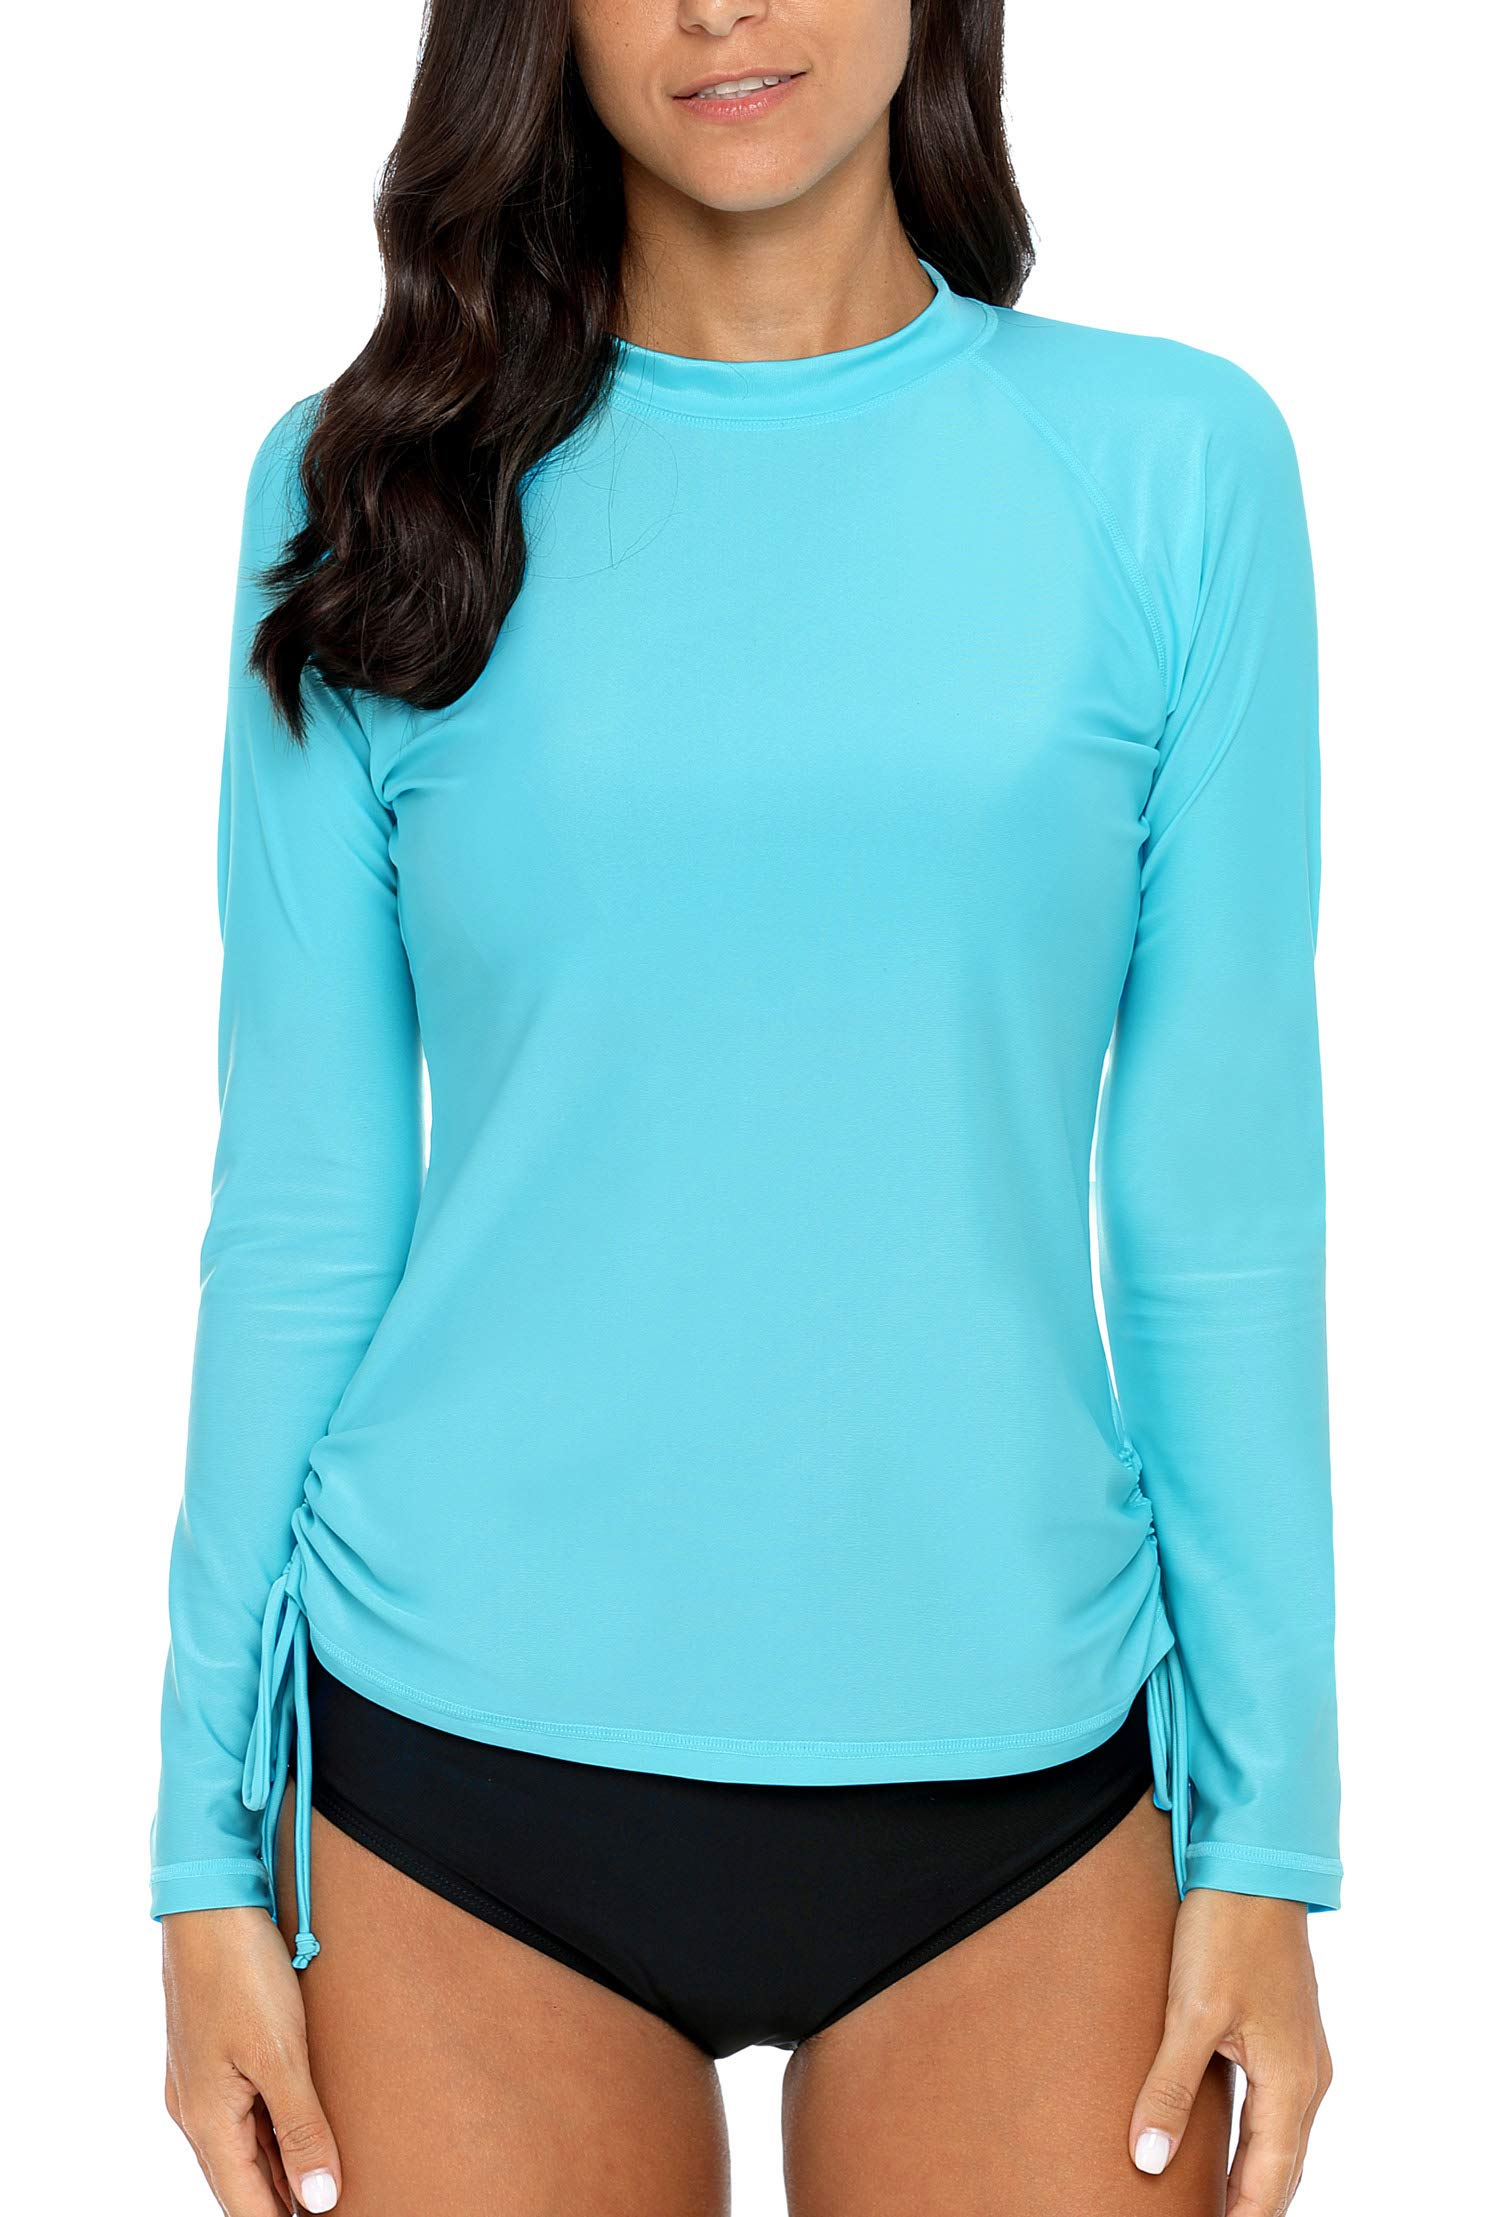 ALove Womens Drawstring Rash Guard Shirt UV Protection Swim Shirts Aqua M by ALove (Image #2)